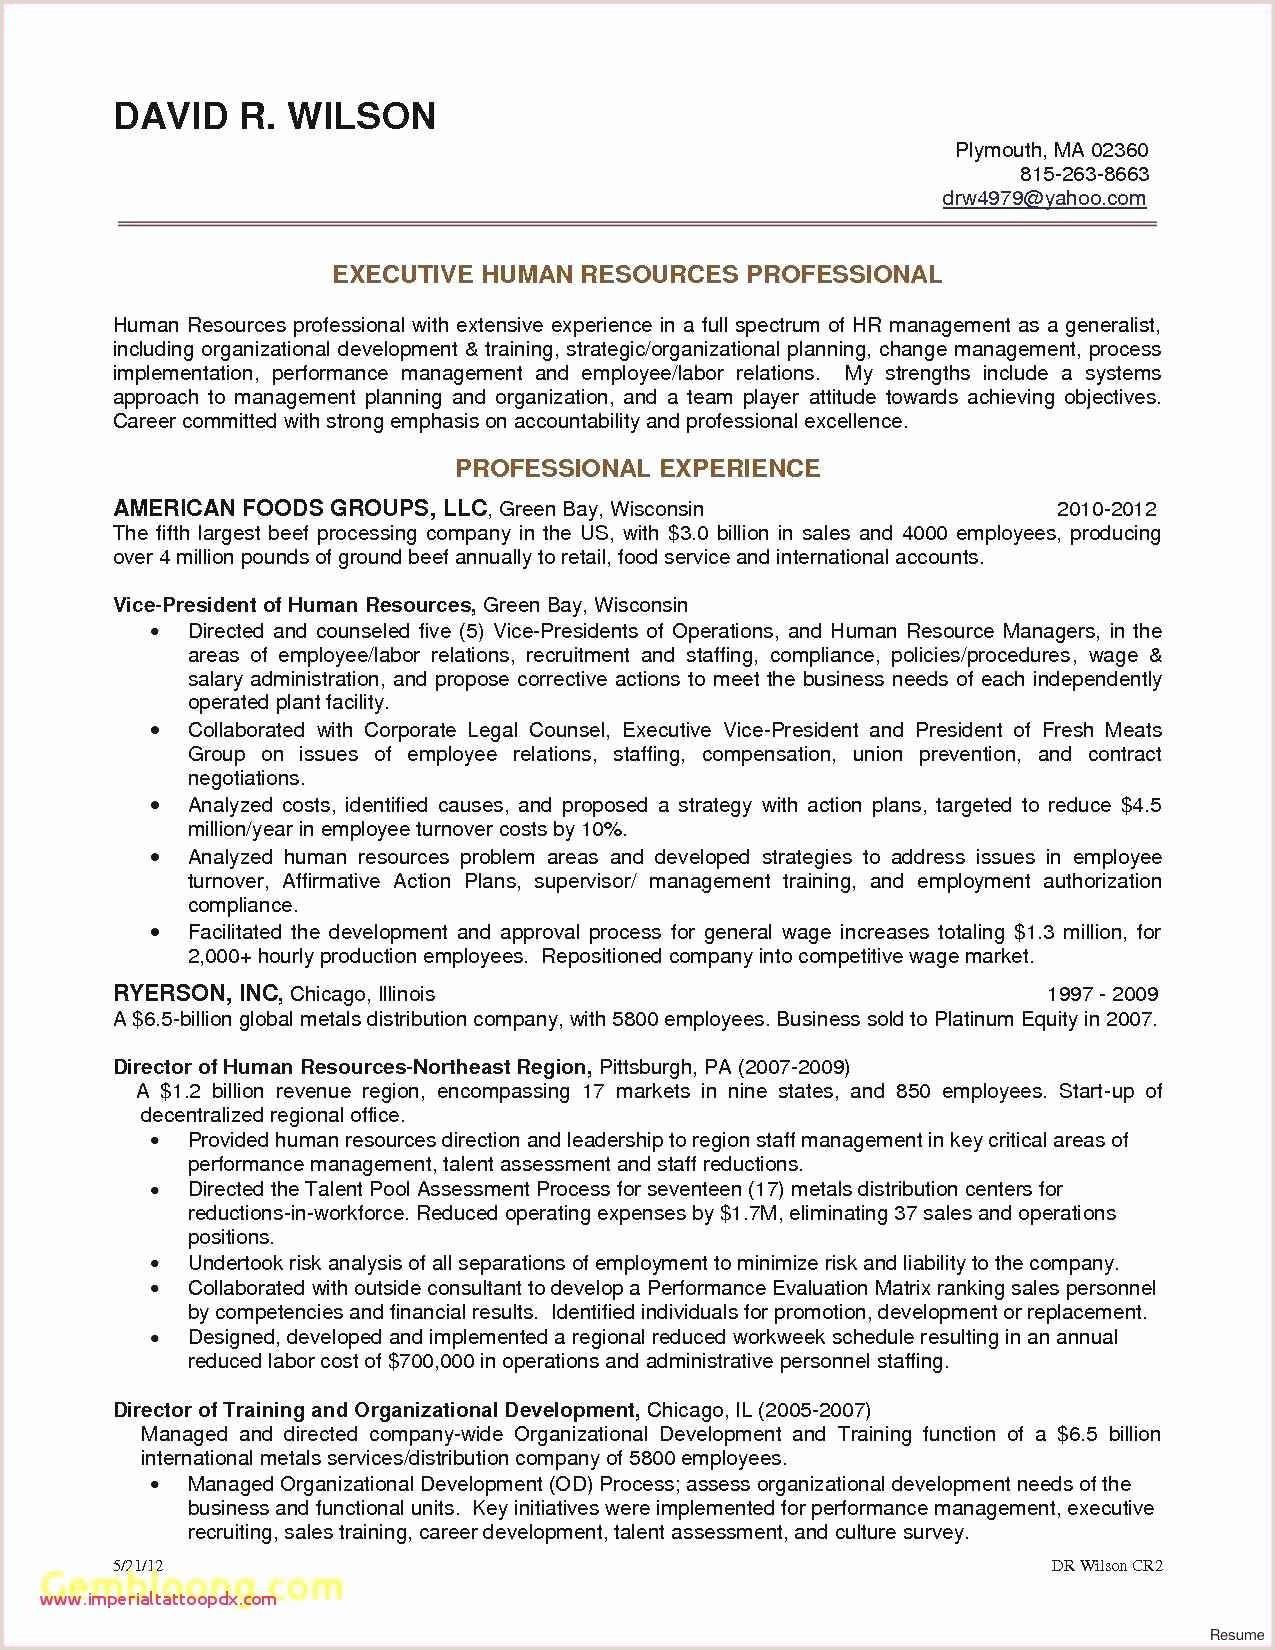 resume for accountant ardocsurvey